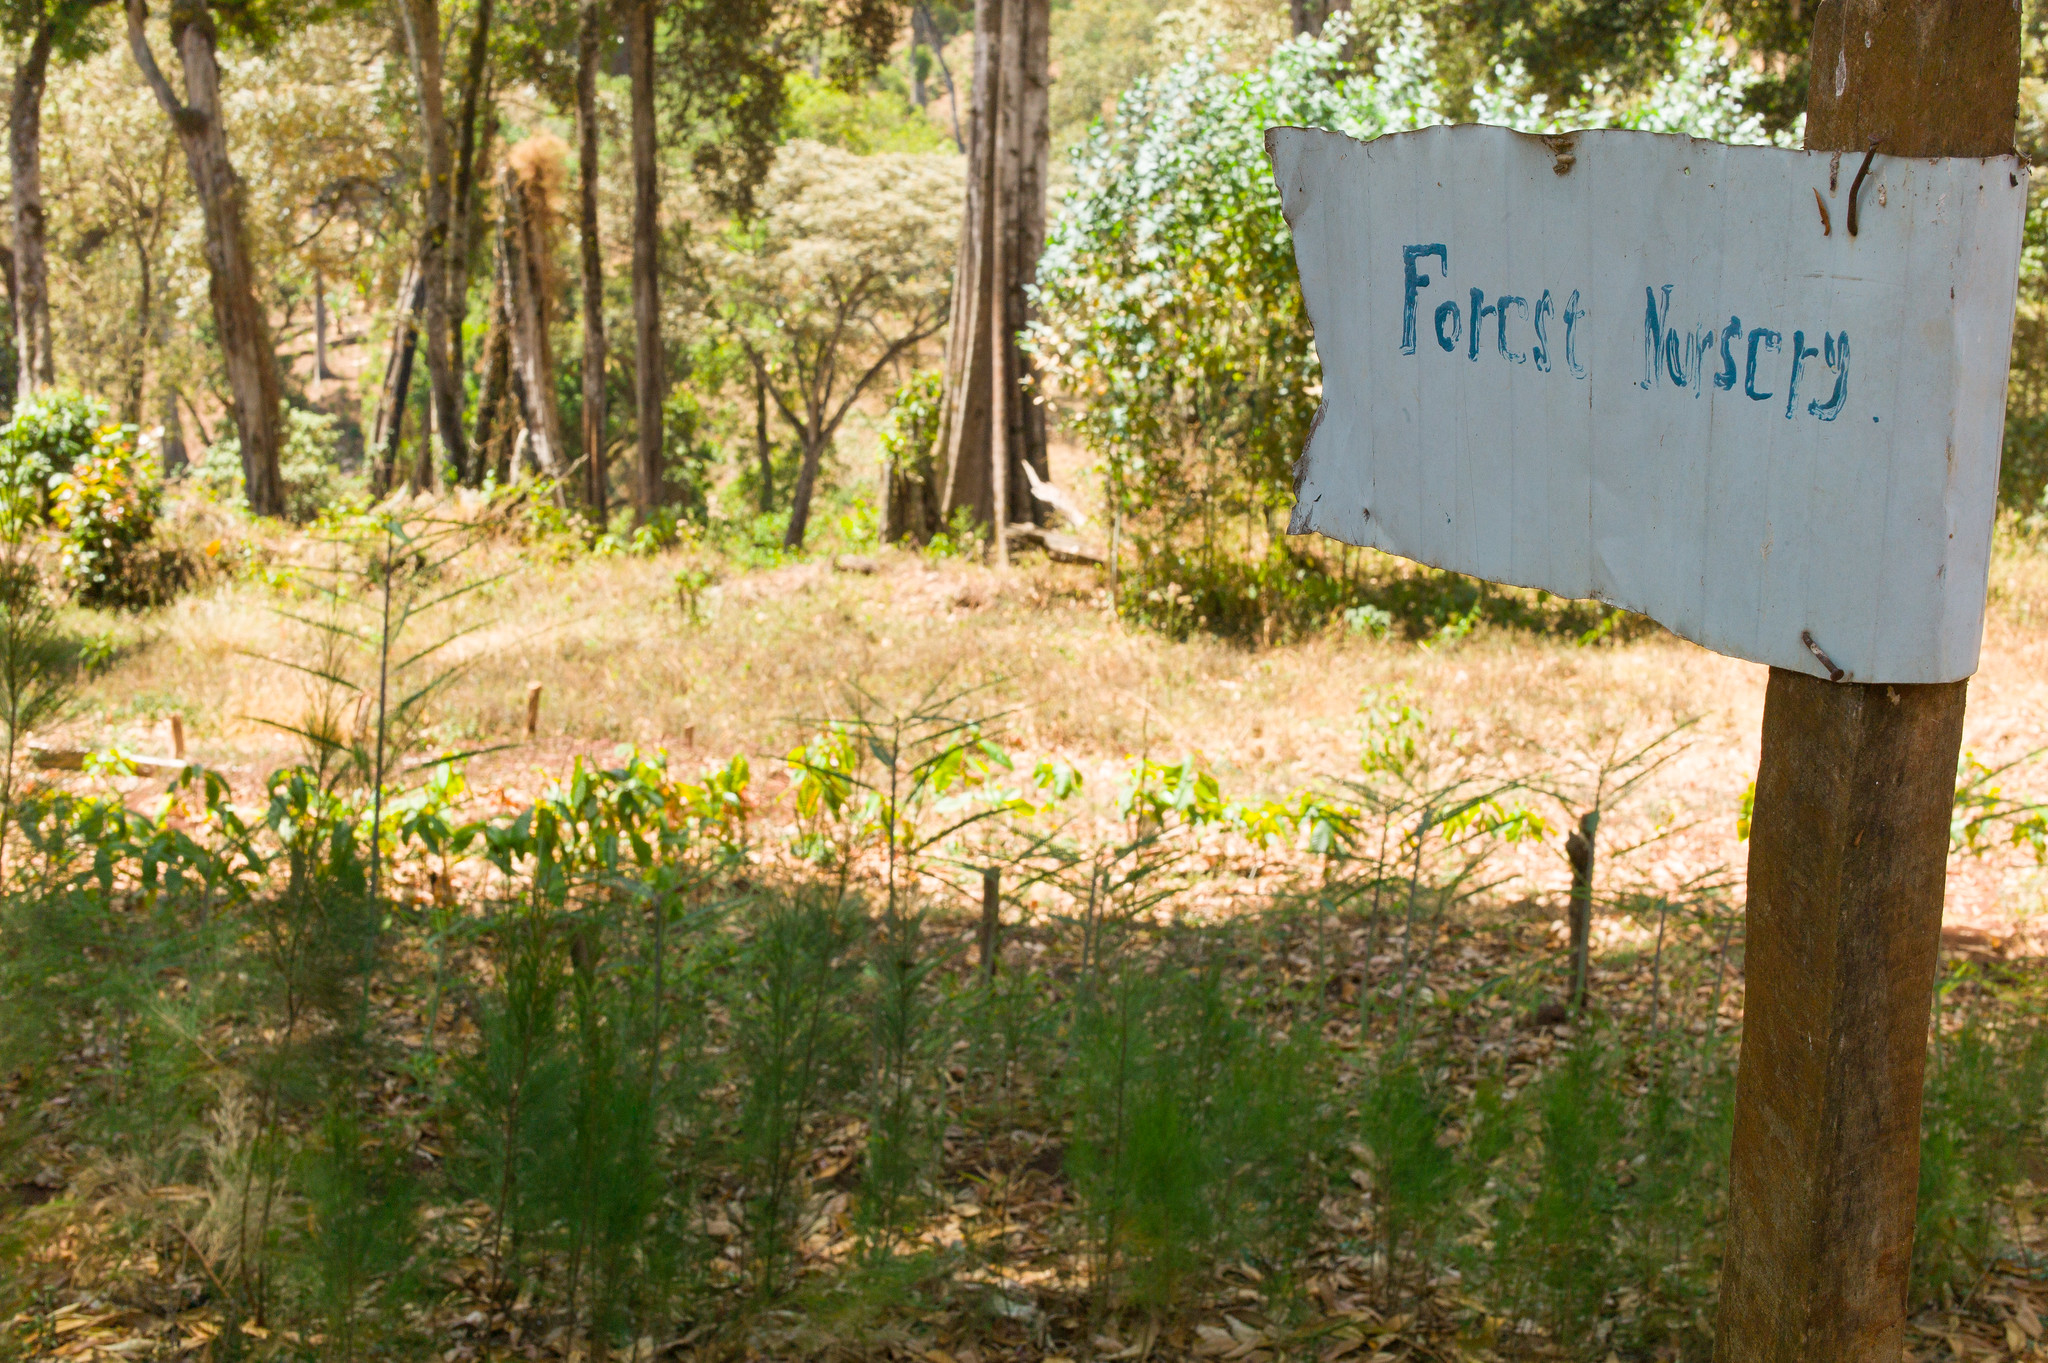 forest nursery